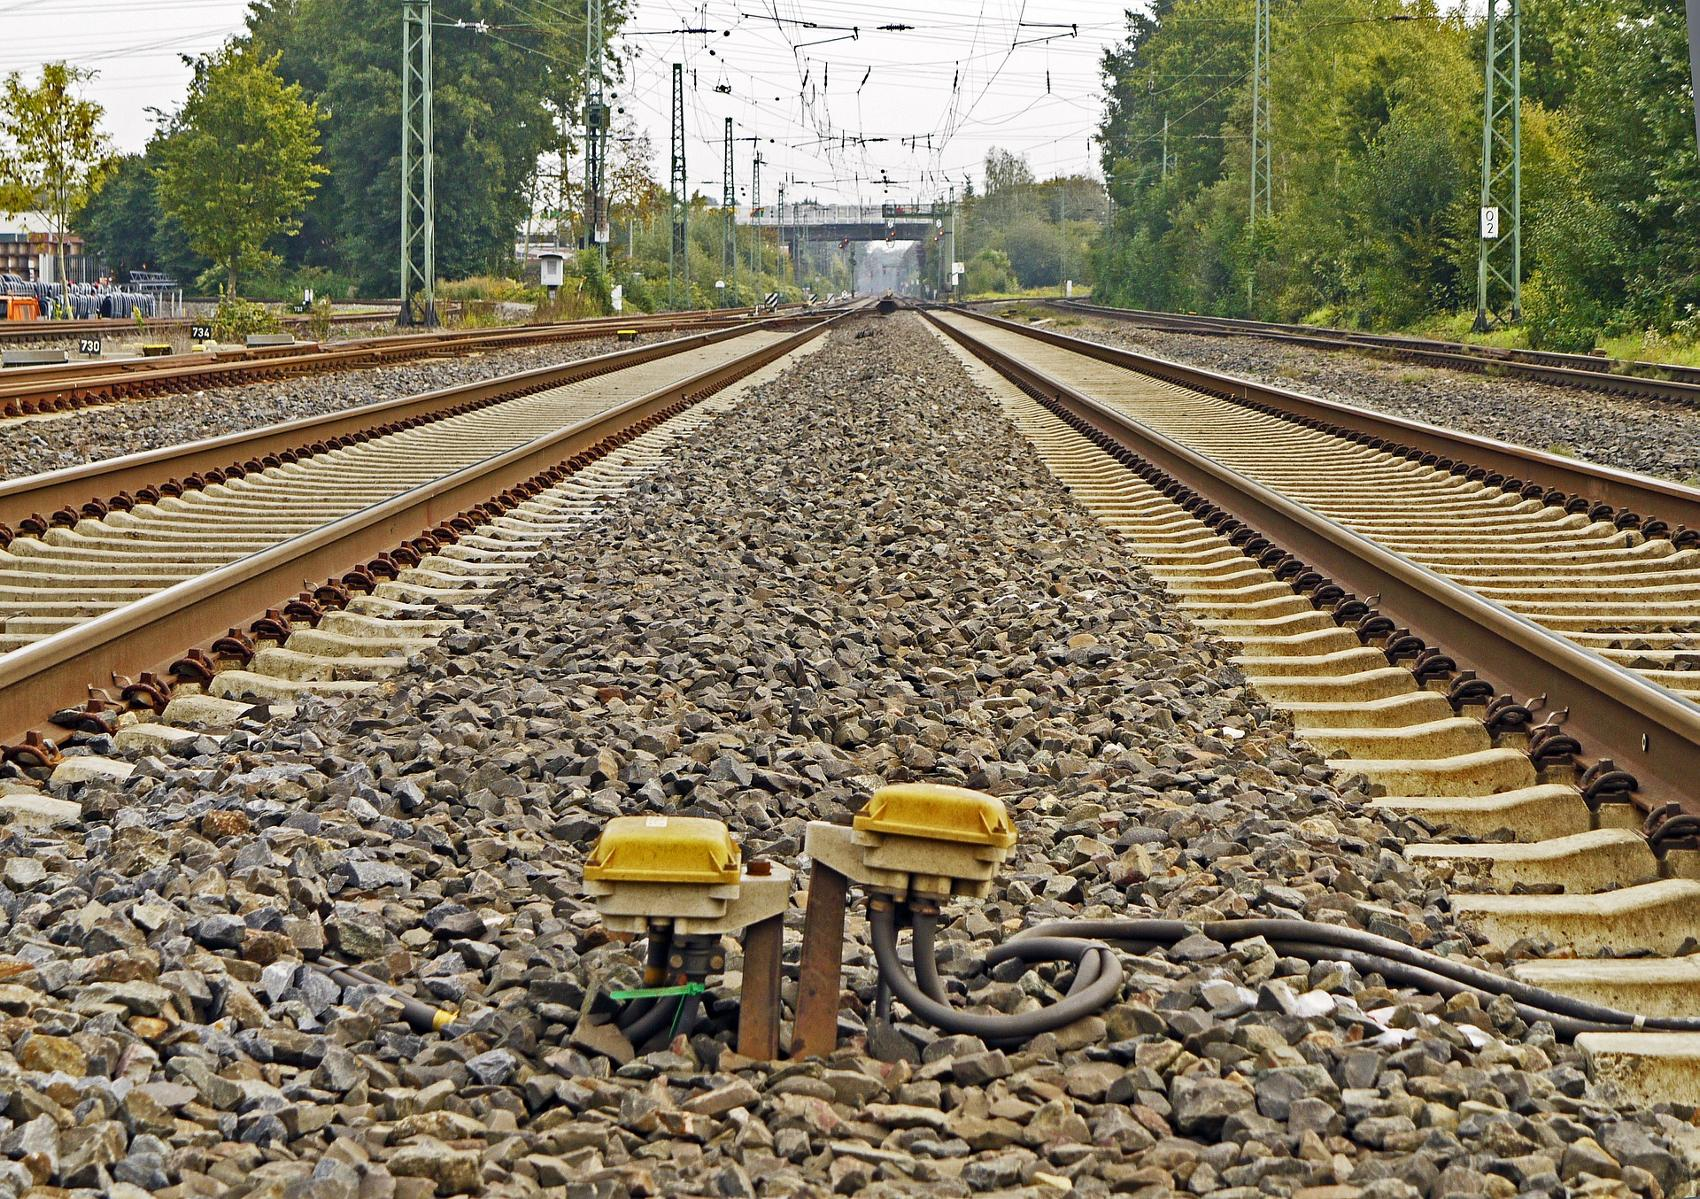 Gleise Bahn Zug